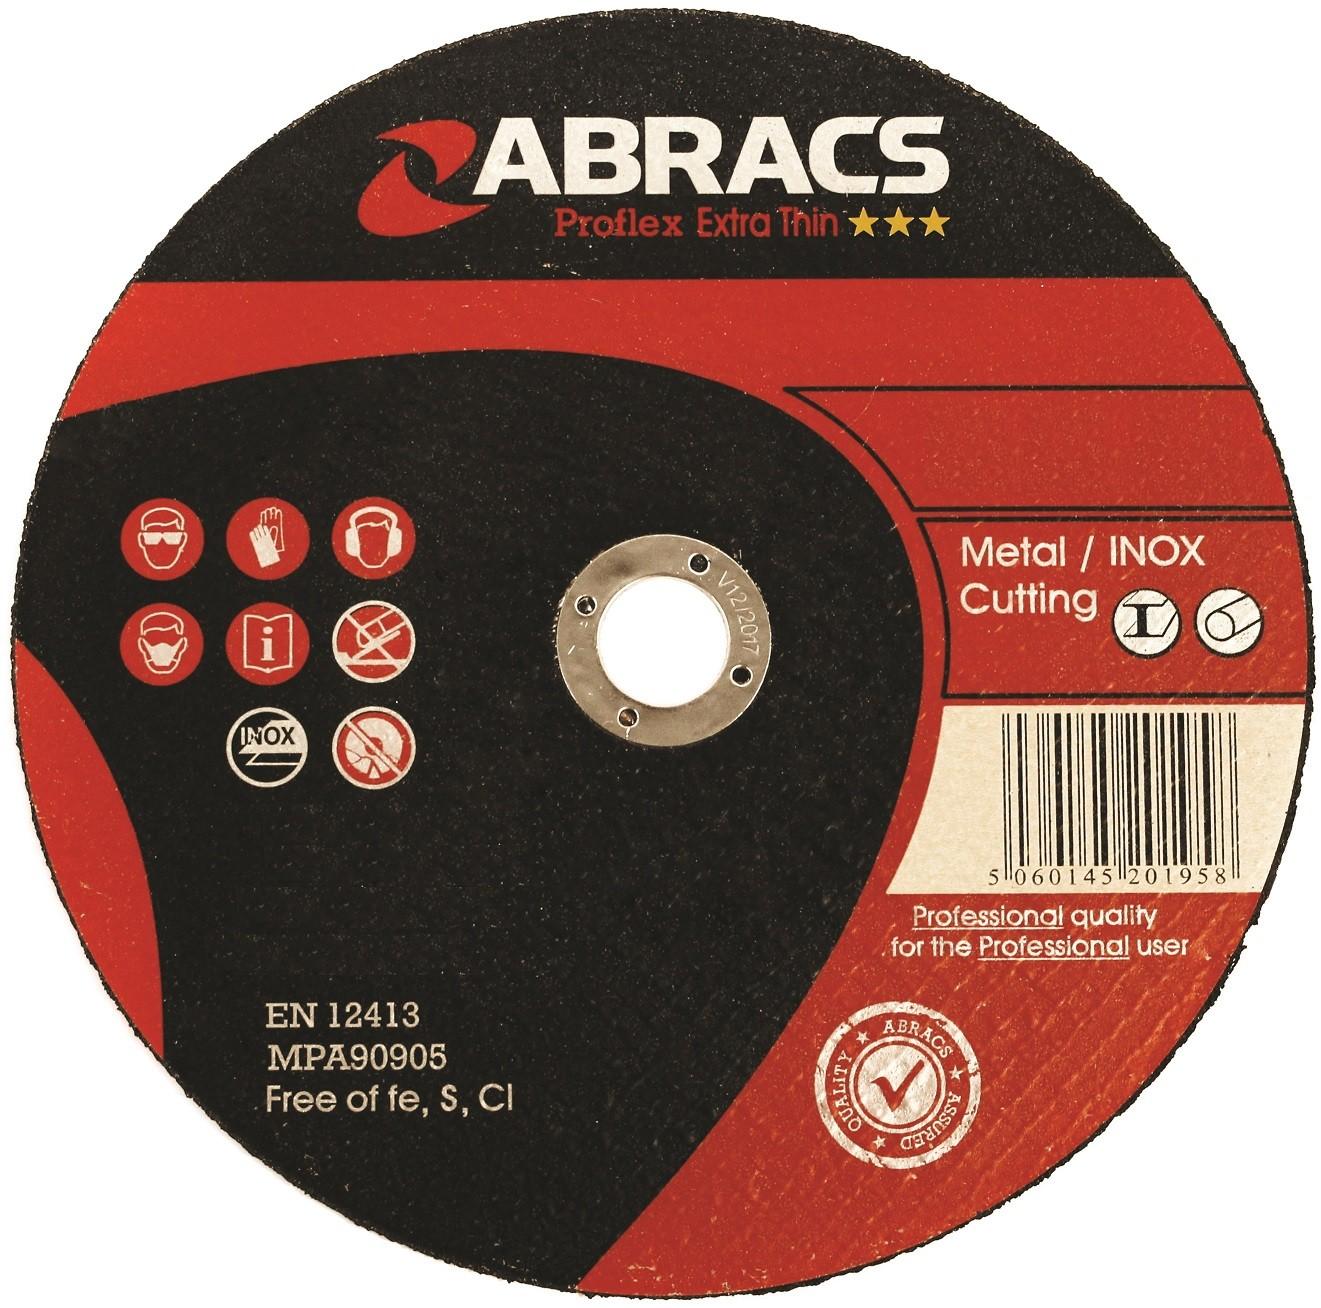 "Extra Thin INOX Cutting Disc 4 1/2"" Abracs 115 x 1.0 x 22mm"